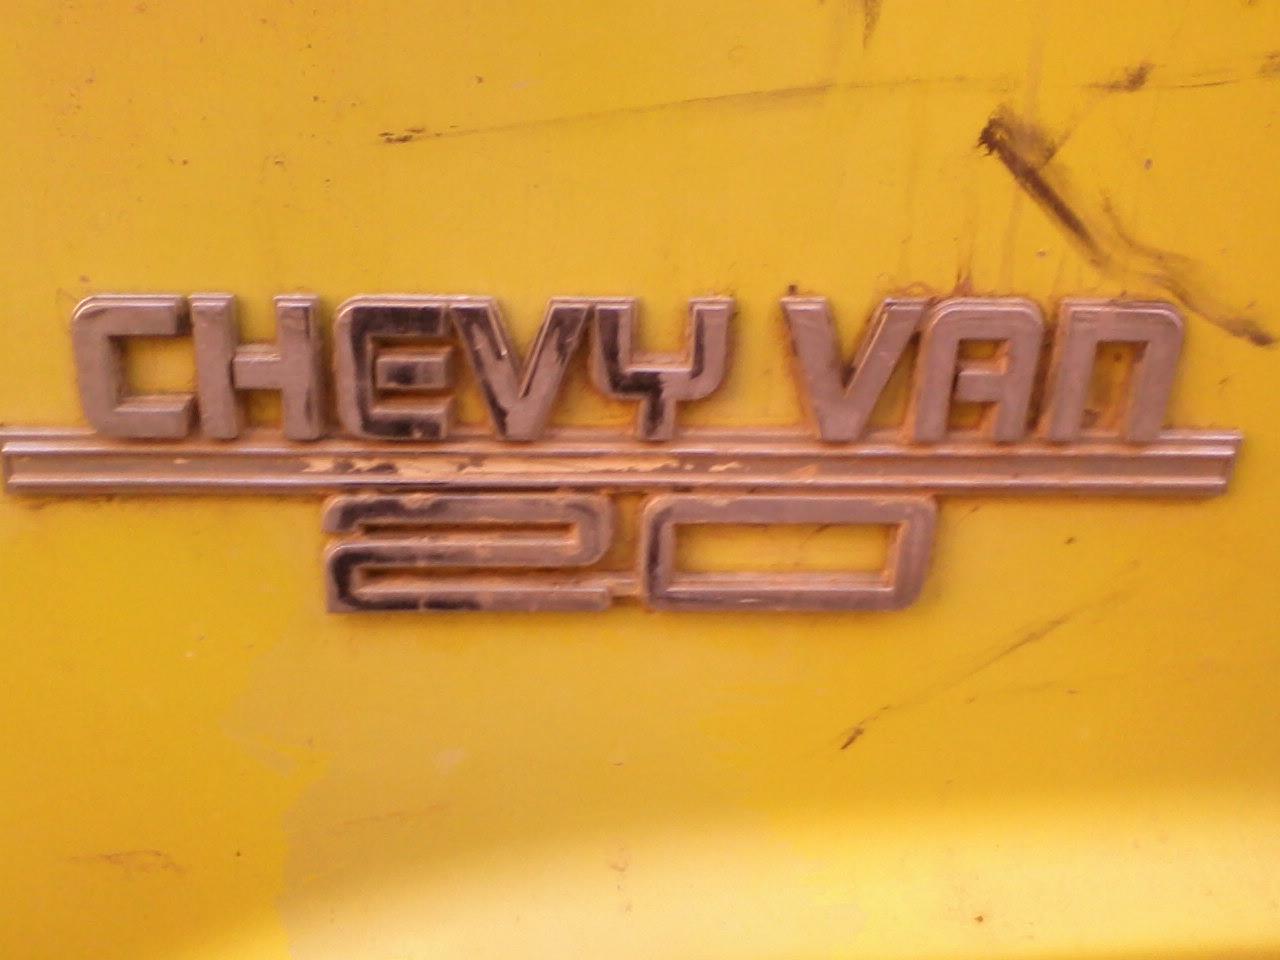 Chevy+van+hmadna+relizane+(1).jpg